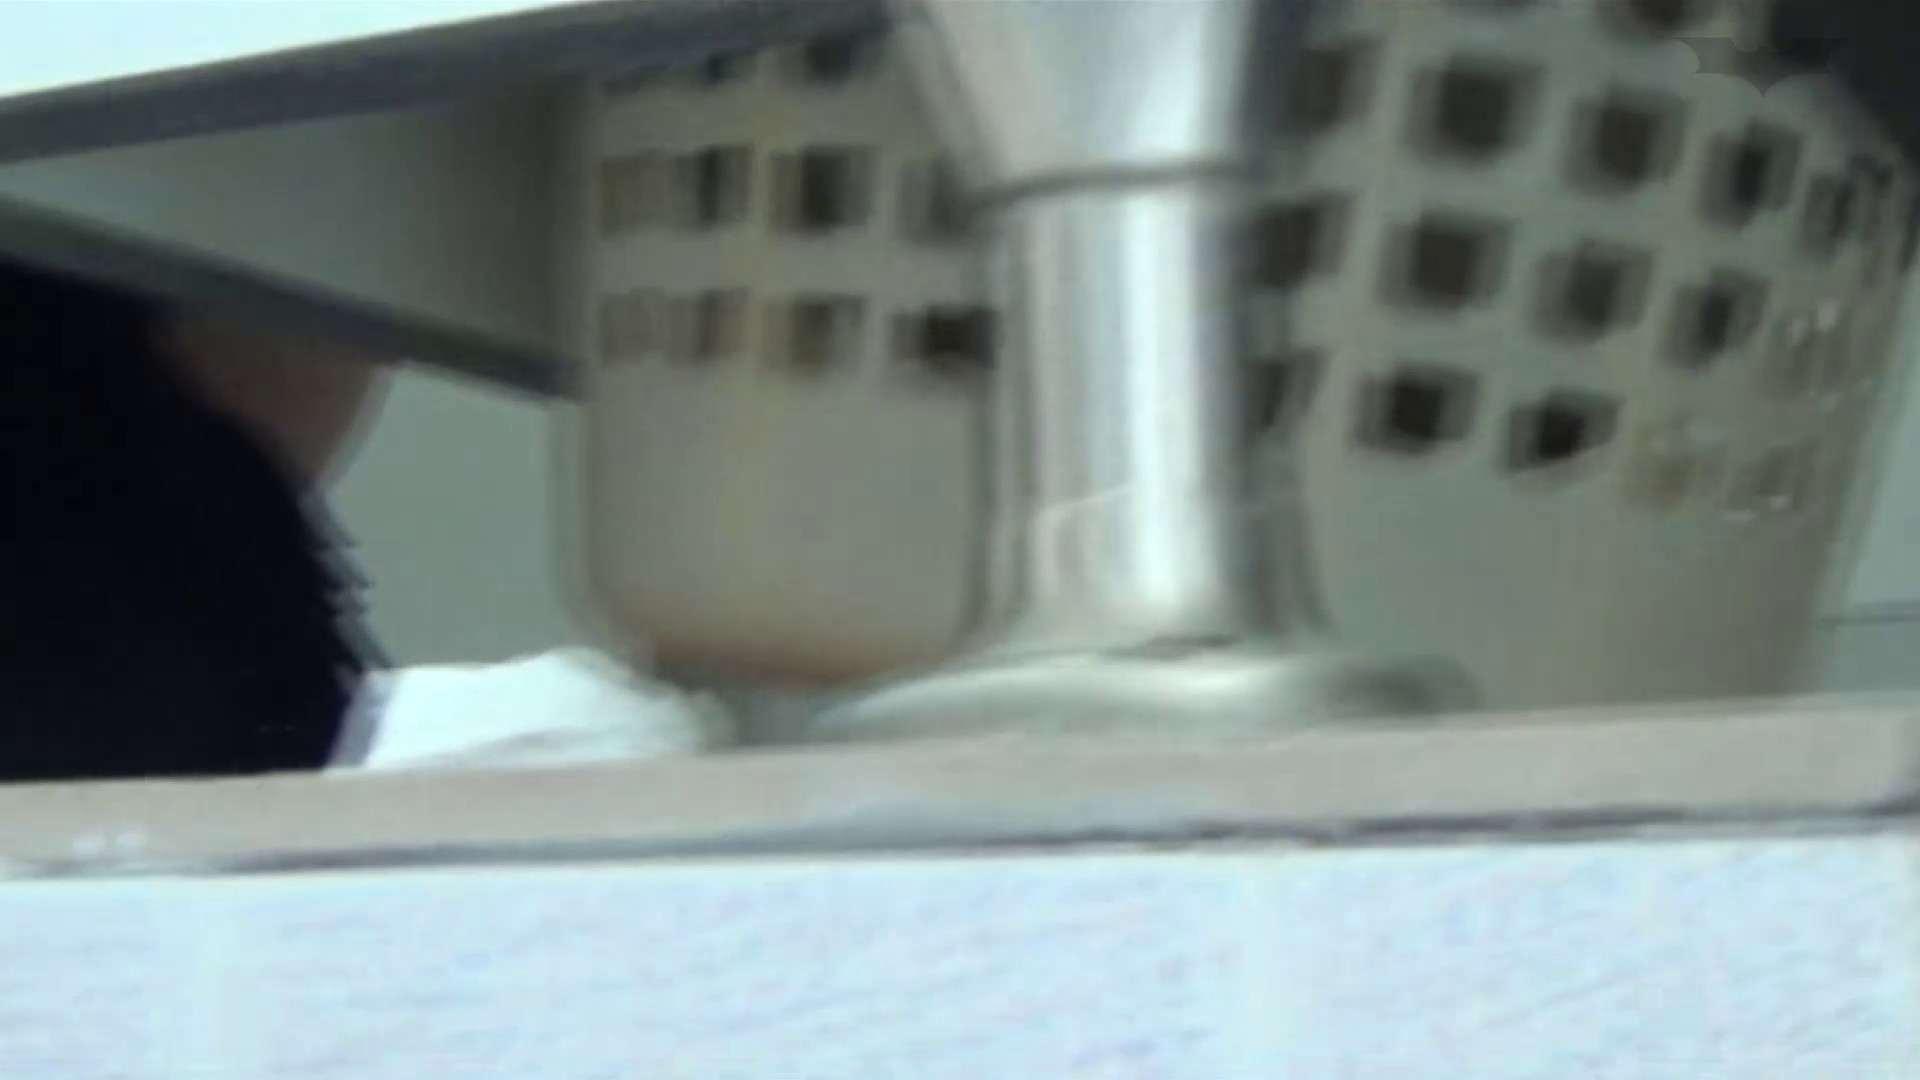 JD盗撮 美女の洗面所の秘密 Vol.46 トイレの中の女の子 ぱこり動画紹介 68連発 29